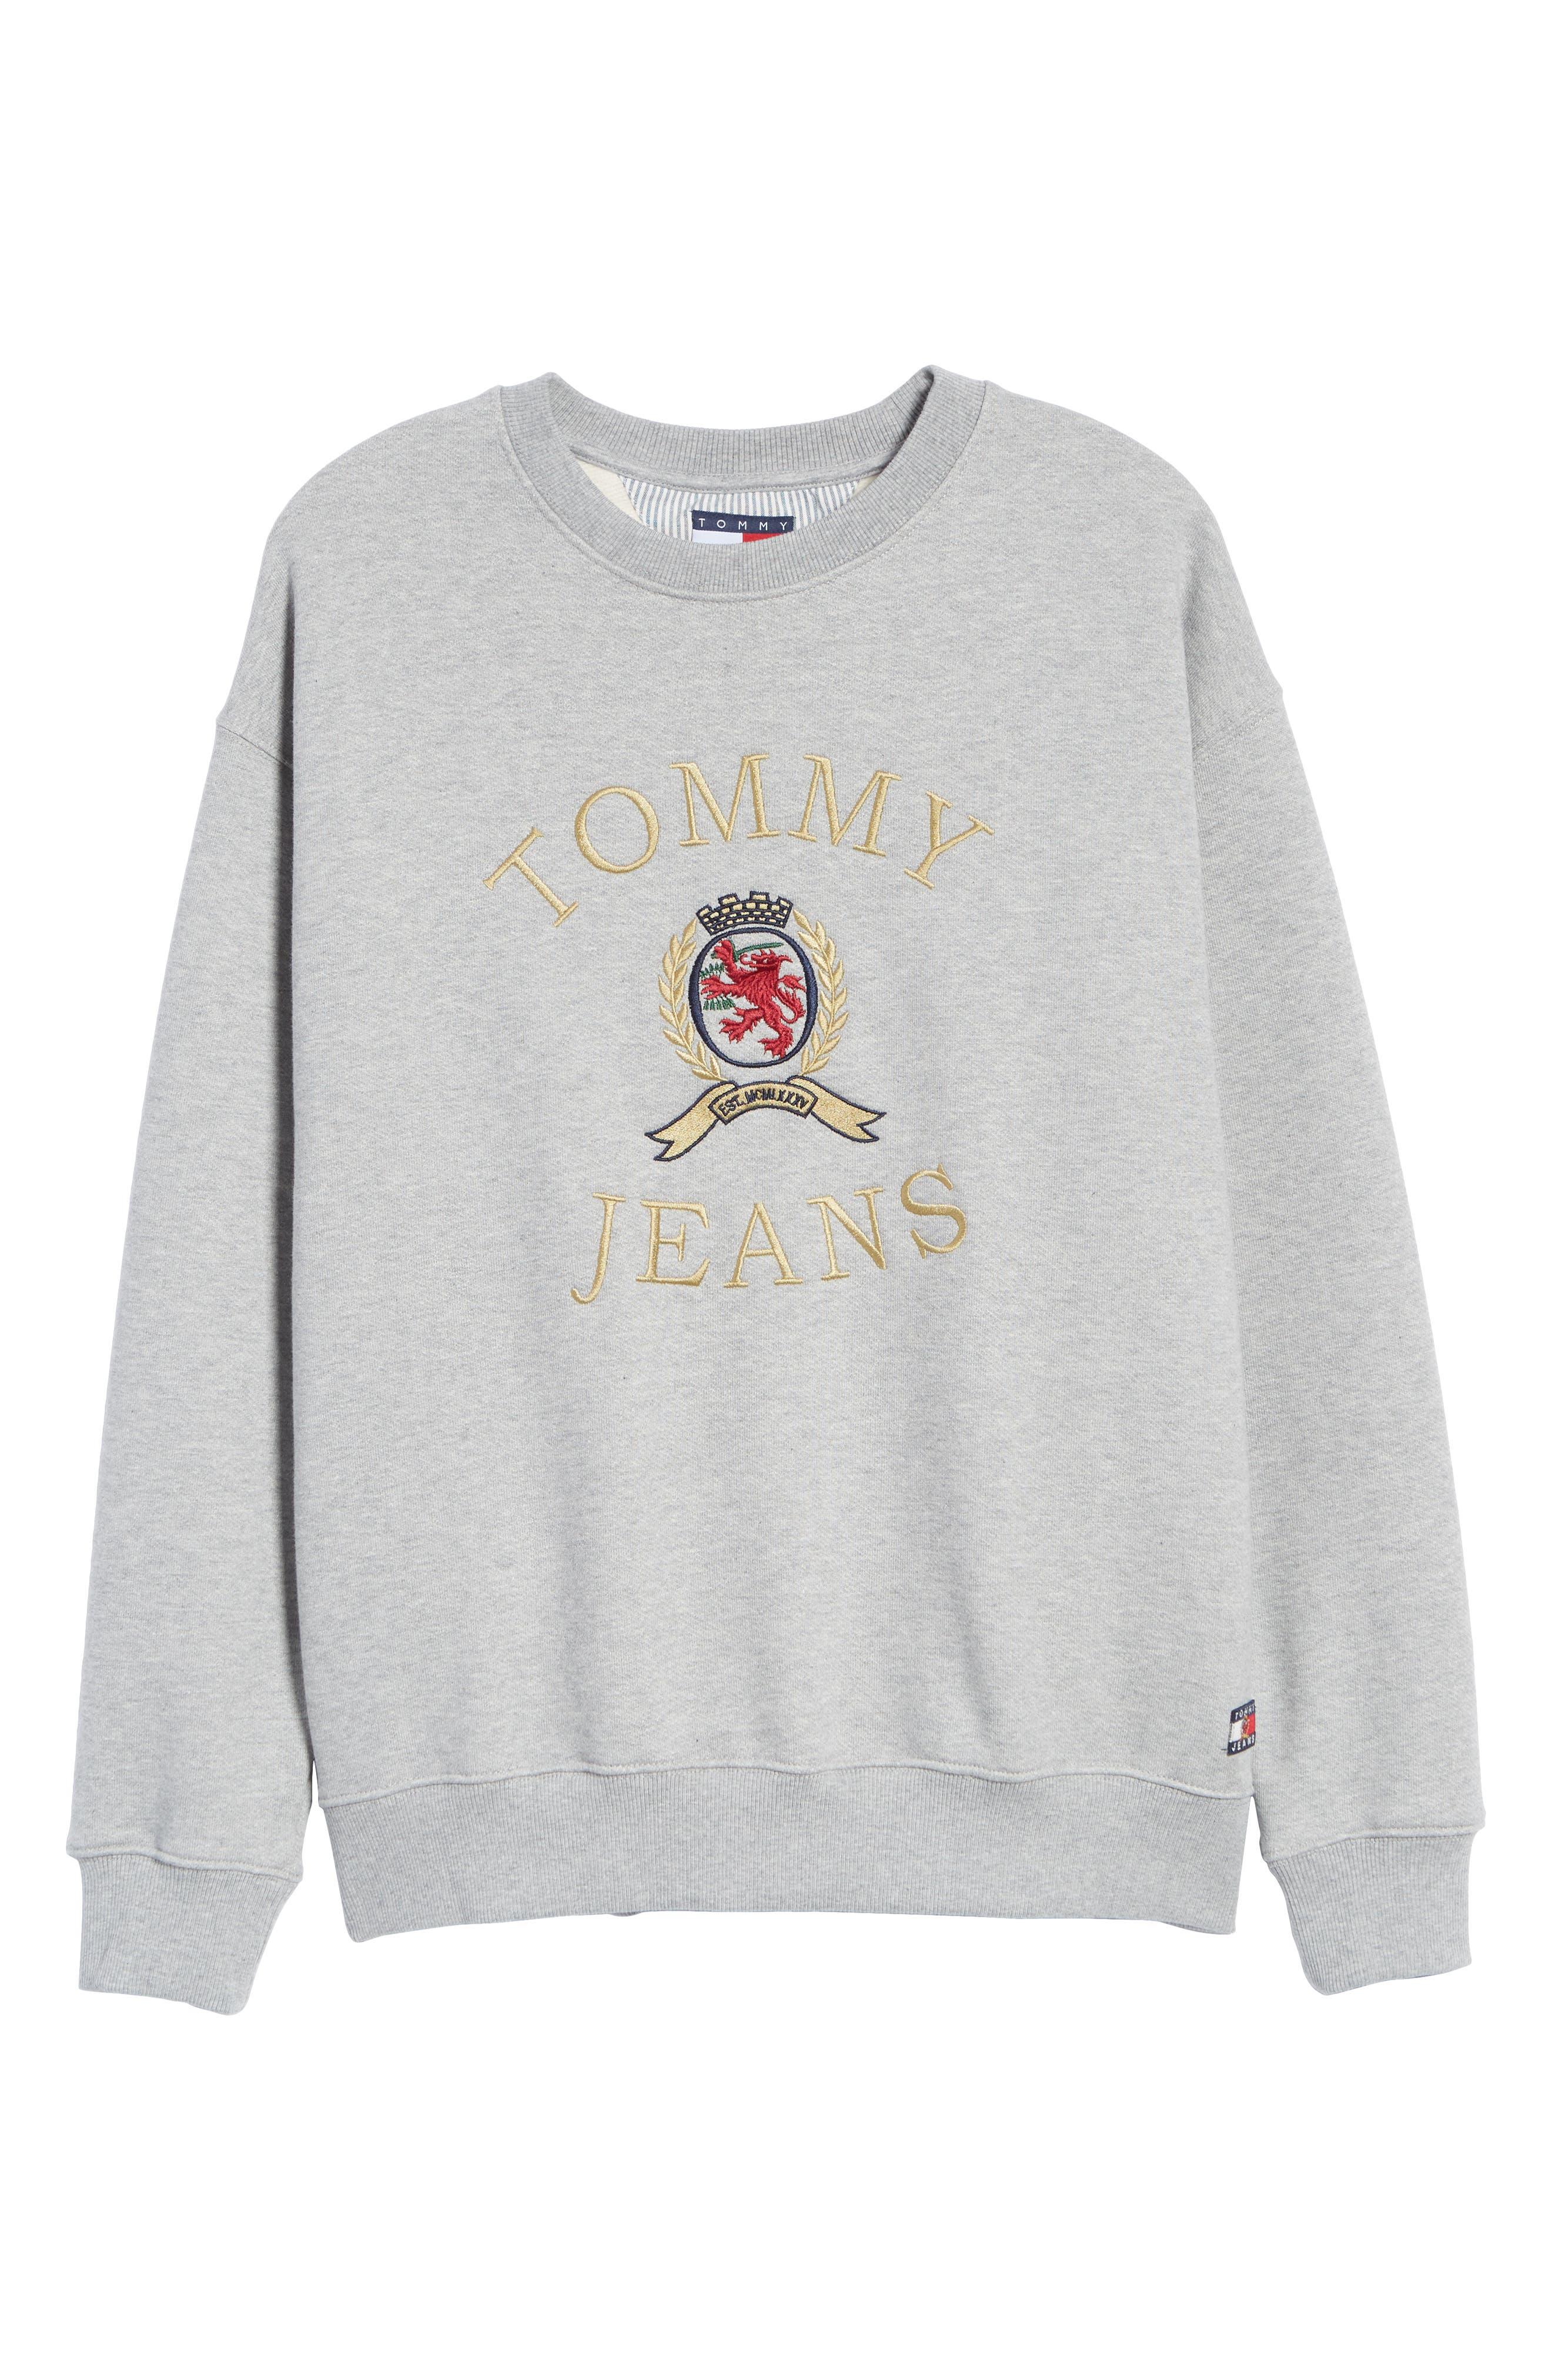 Embroidered Crest Sweatshirt,                             Alternate thumbnail 6, color,                             GREY HTR